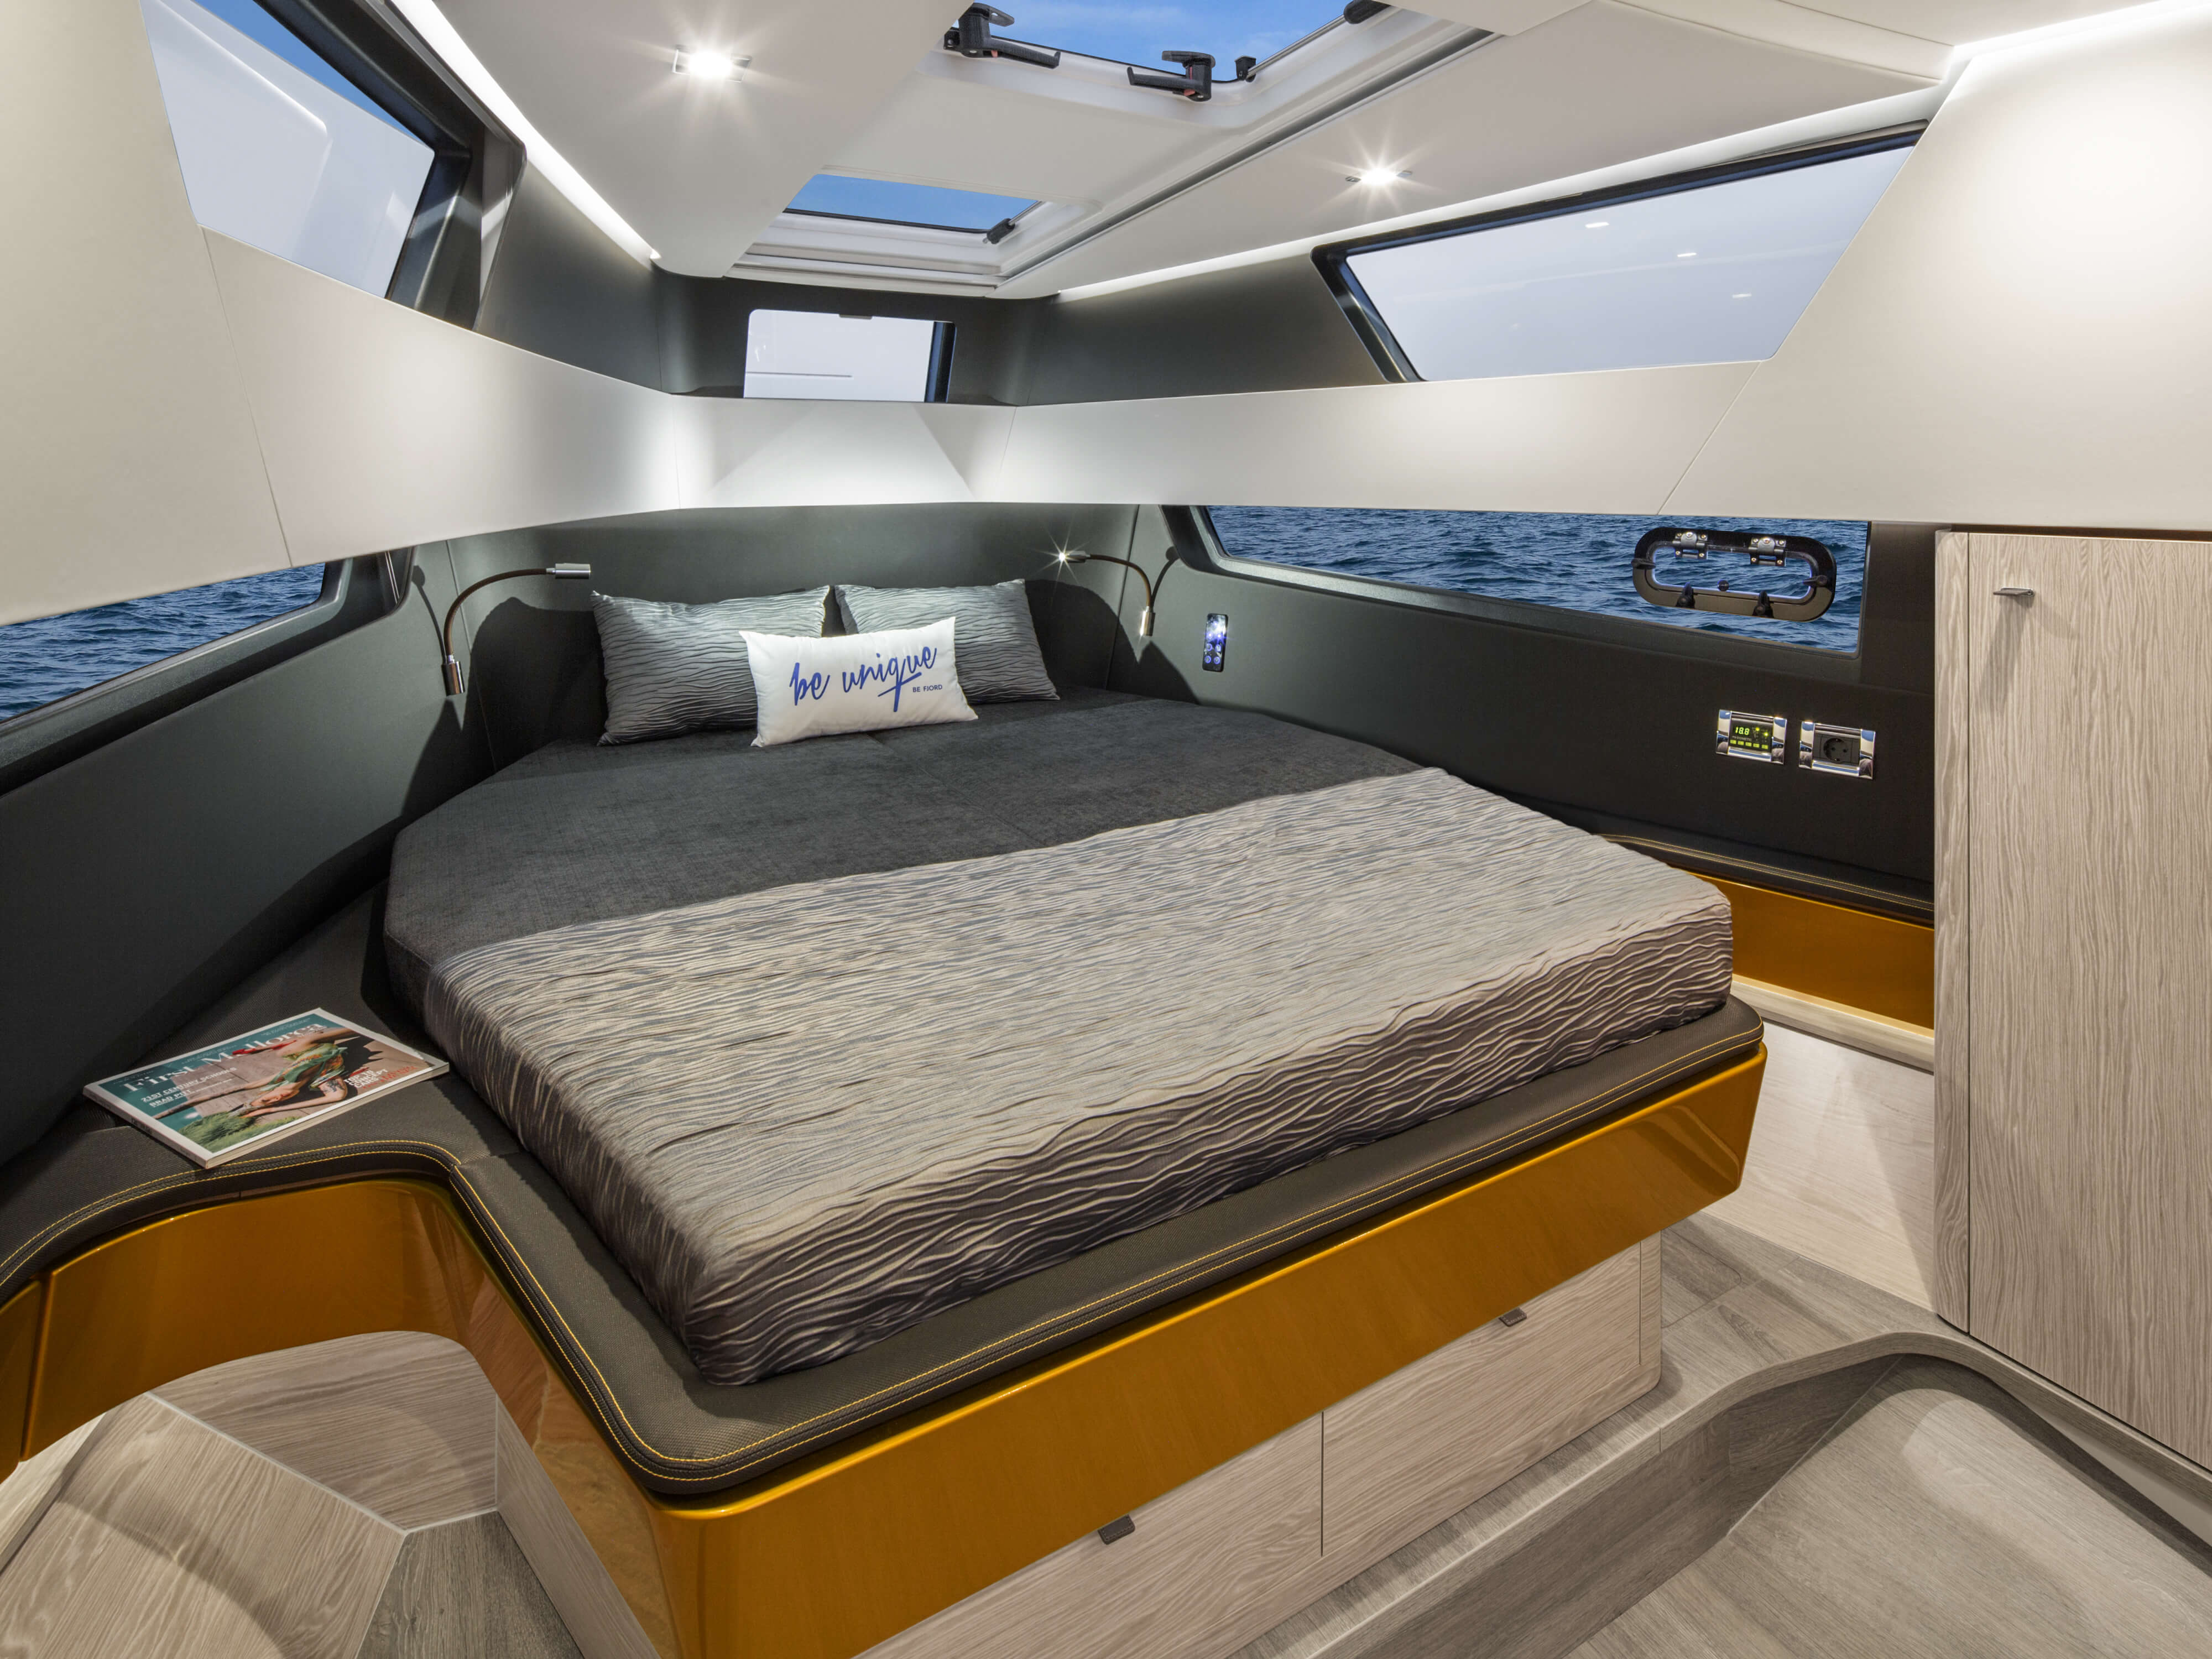 FJORD 41 XL owner's cabin